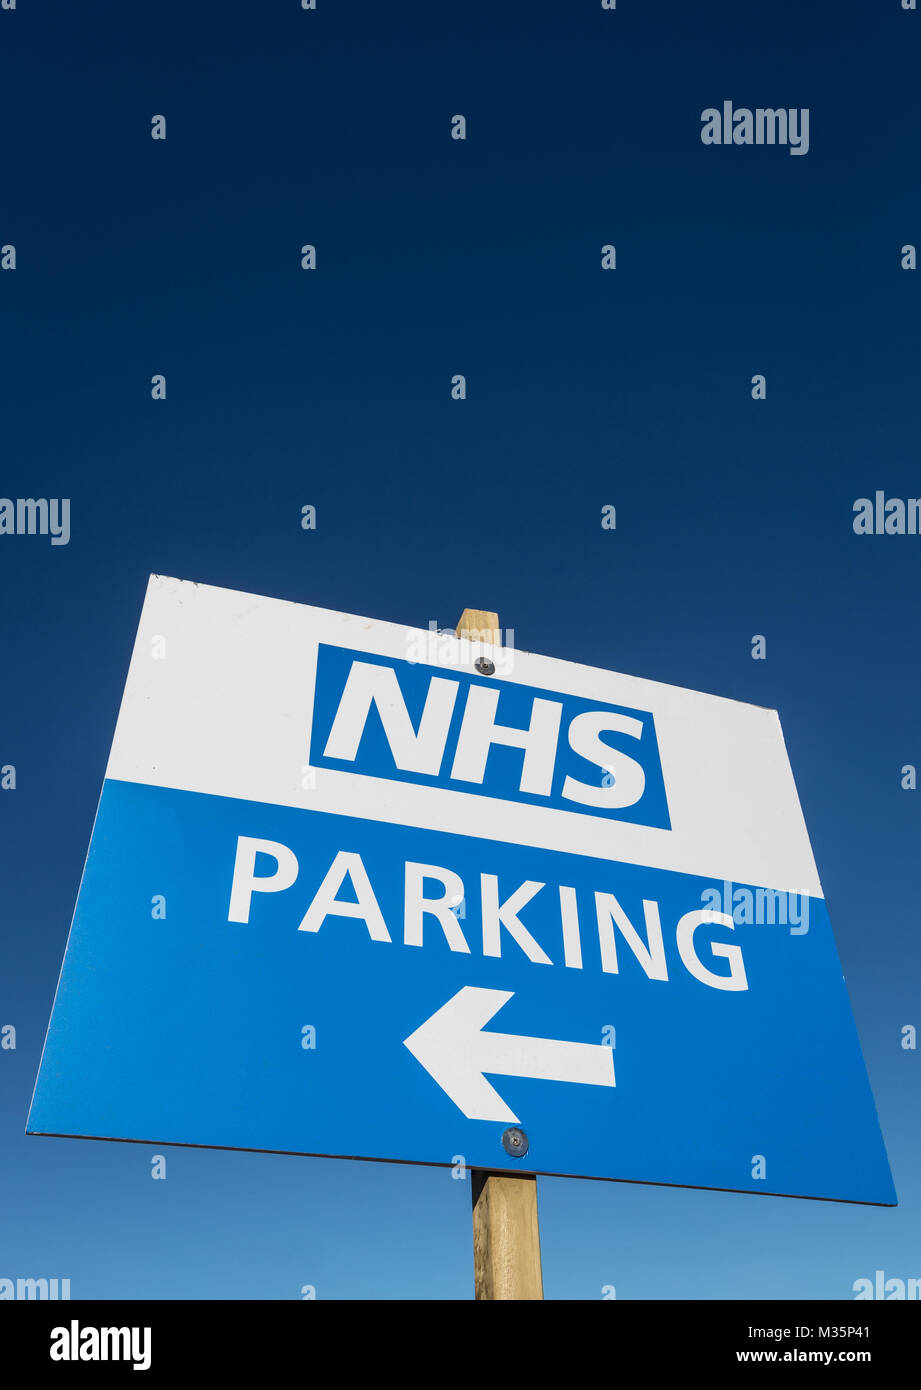 NHS car parking sign - Stock Image